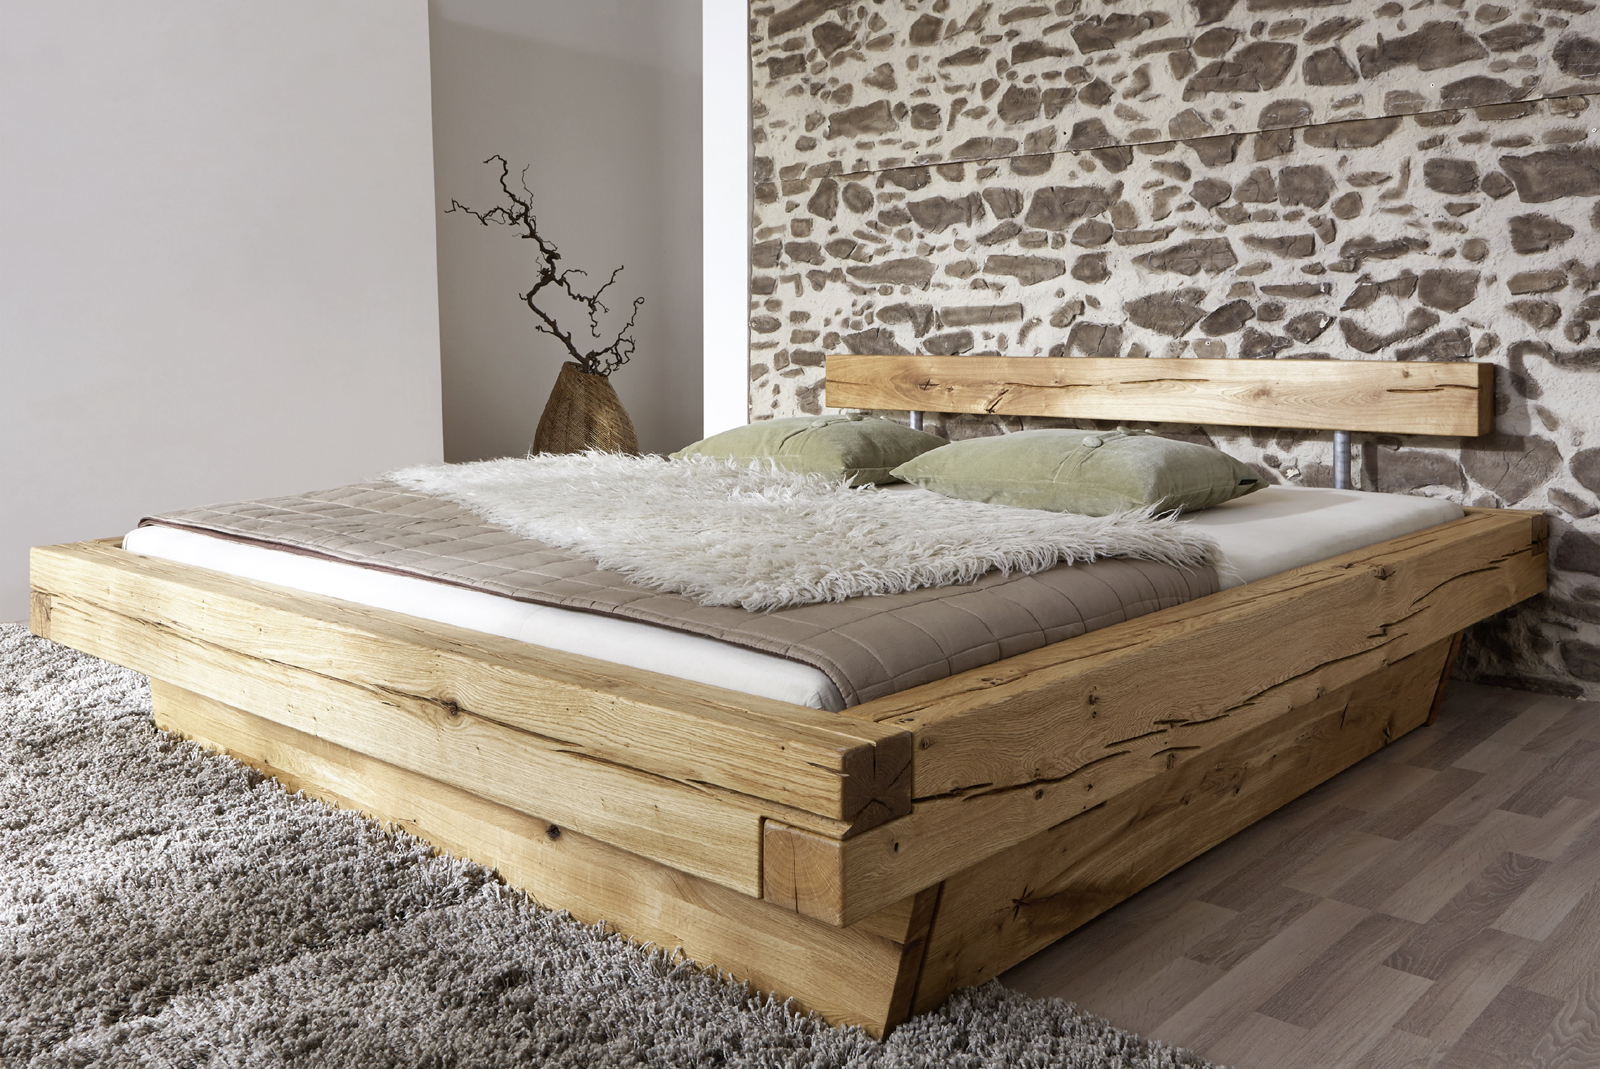 bett 180x200 holzbett mit bettkasten kiefer massiv weiss. Black Bedroom Furniture Sets. Home Design Ideas